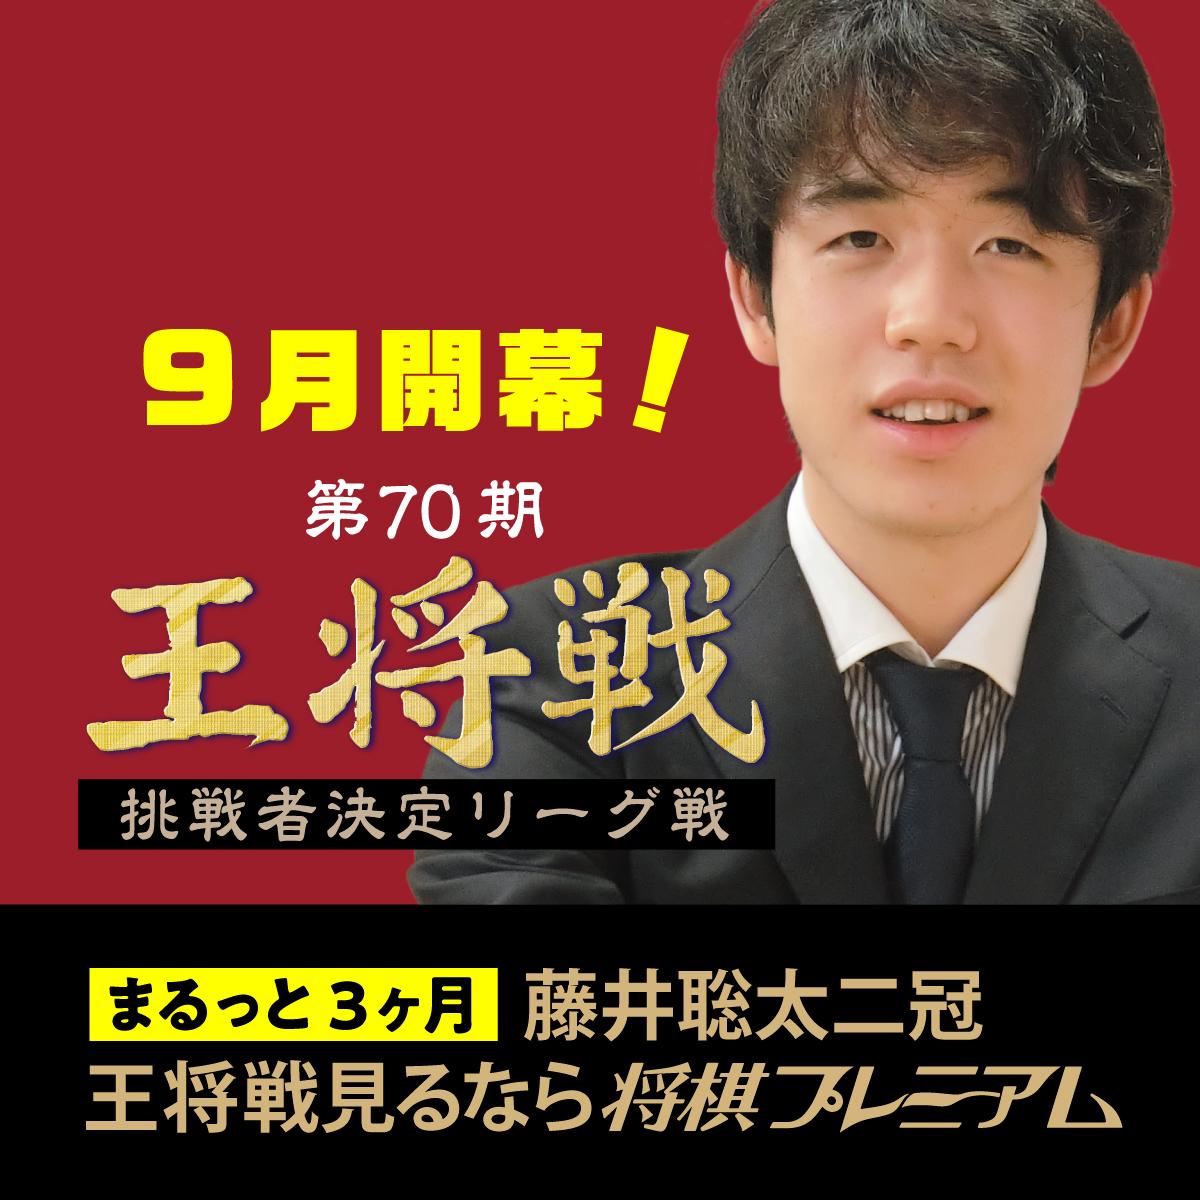 挑戦 リーグ 決定 戦 者 王将